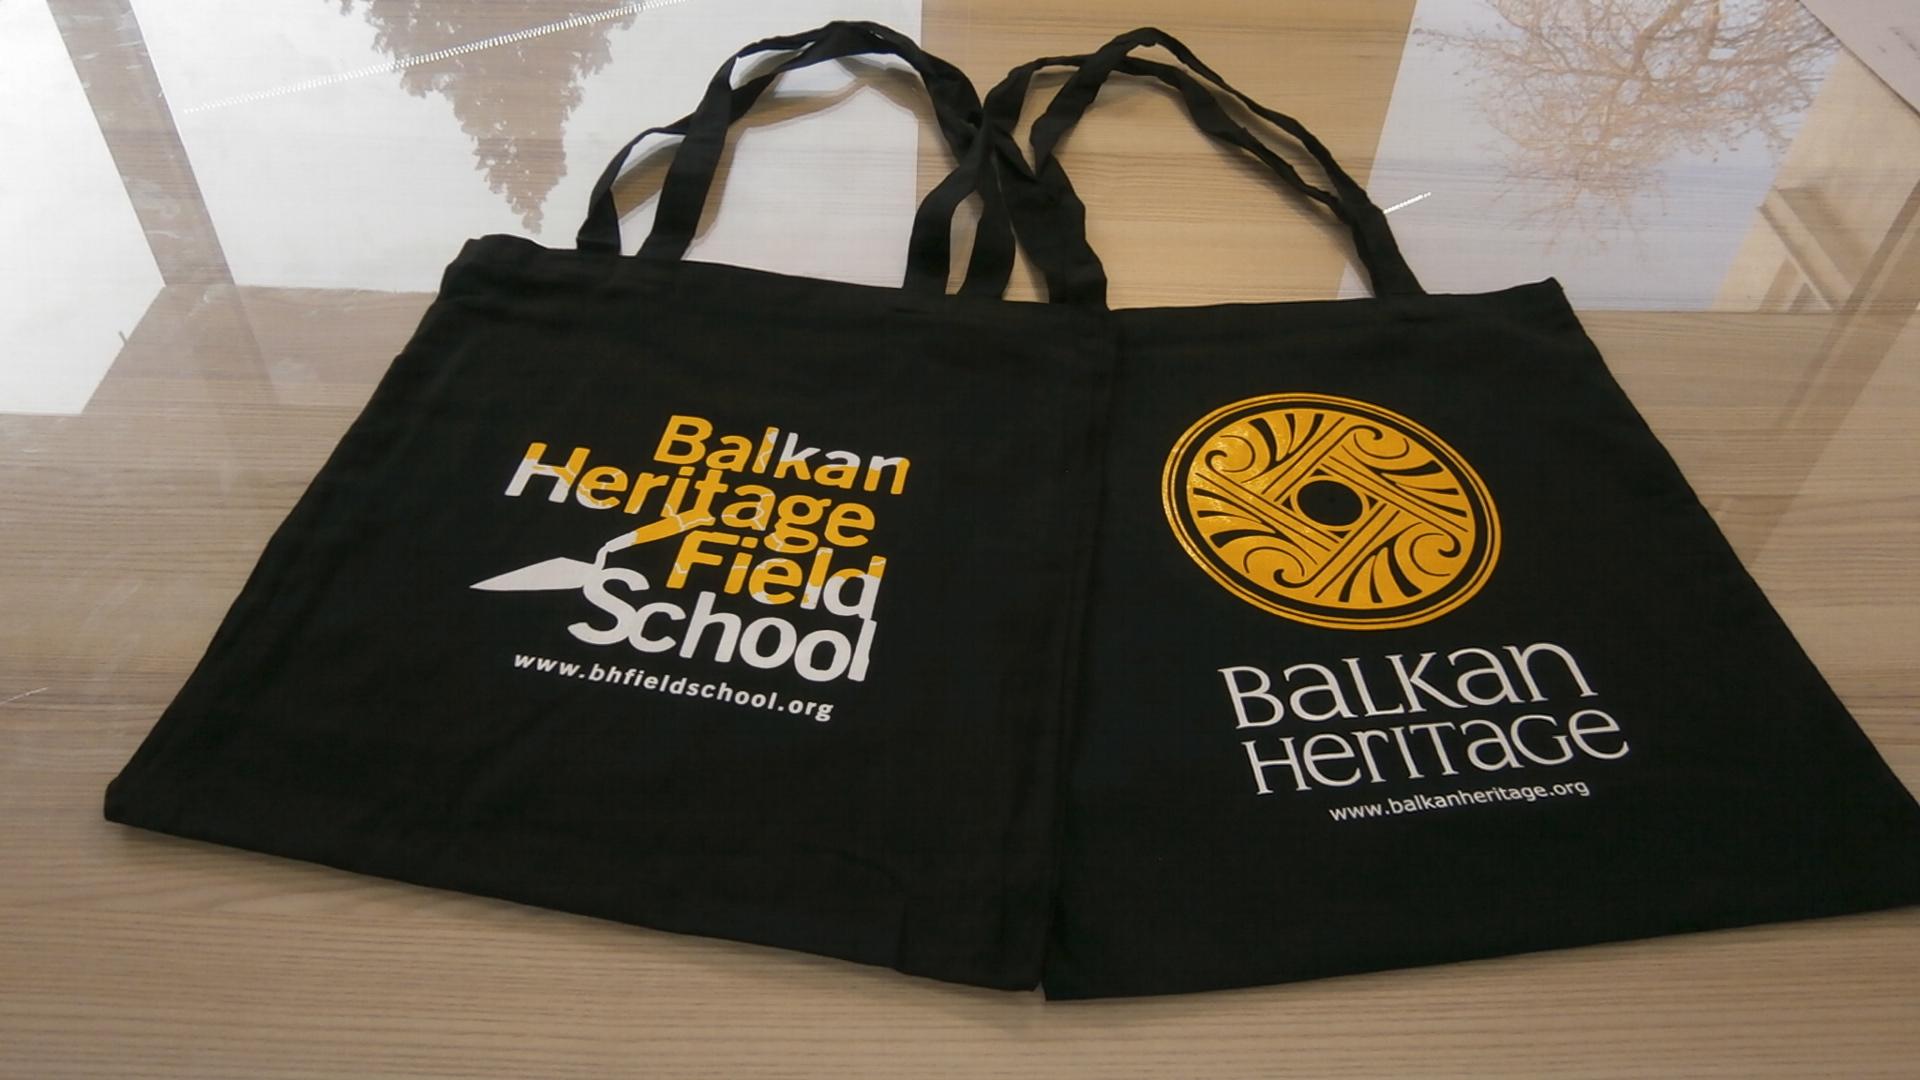 клиент: Balkan heritage